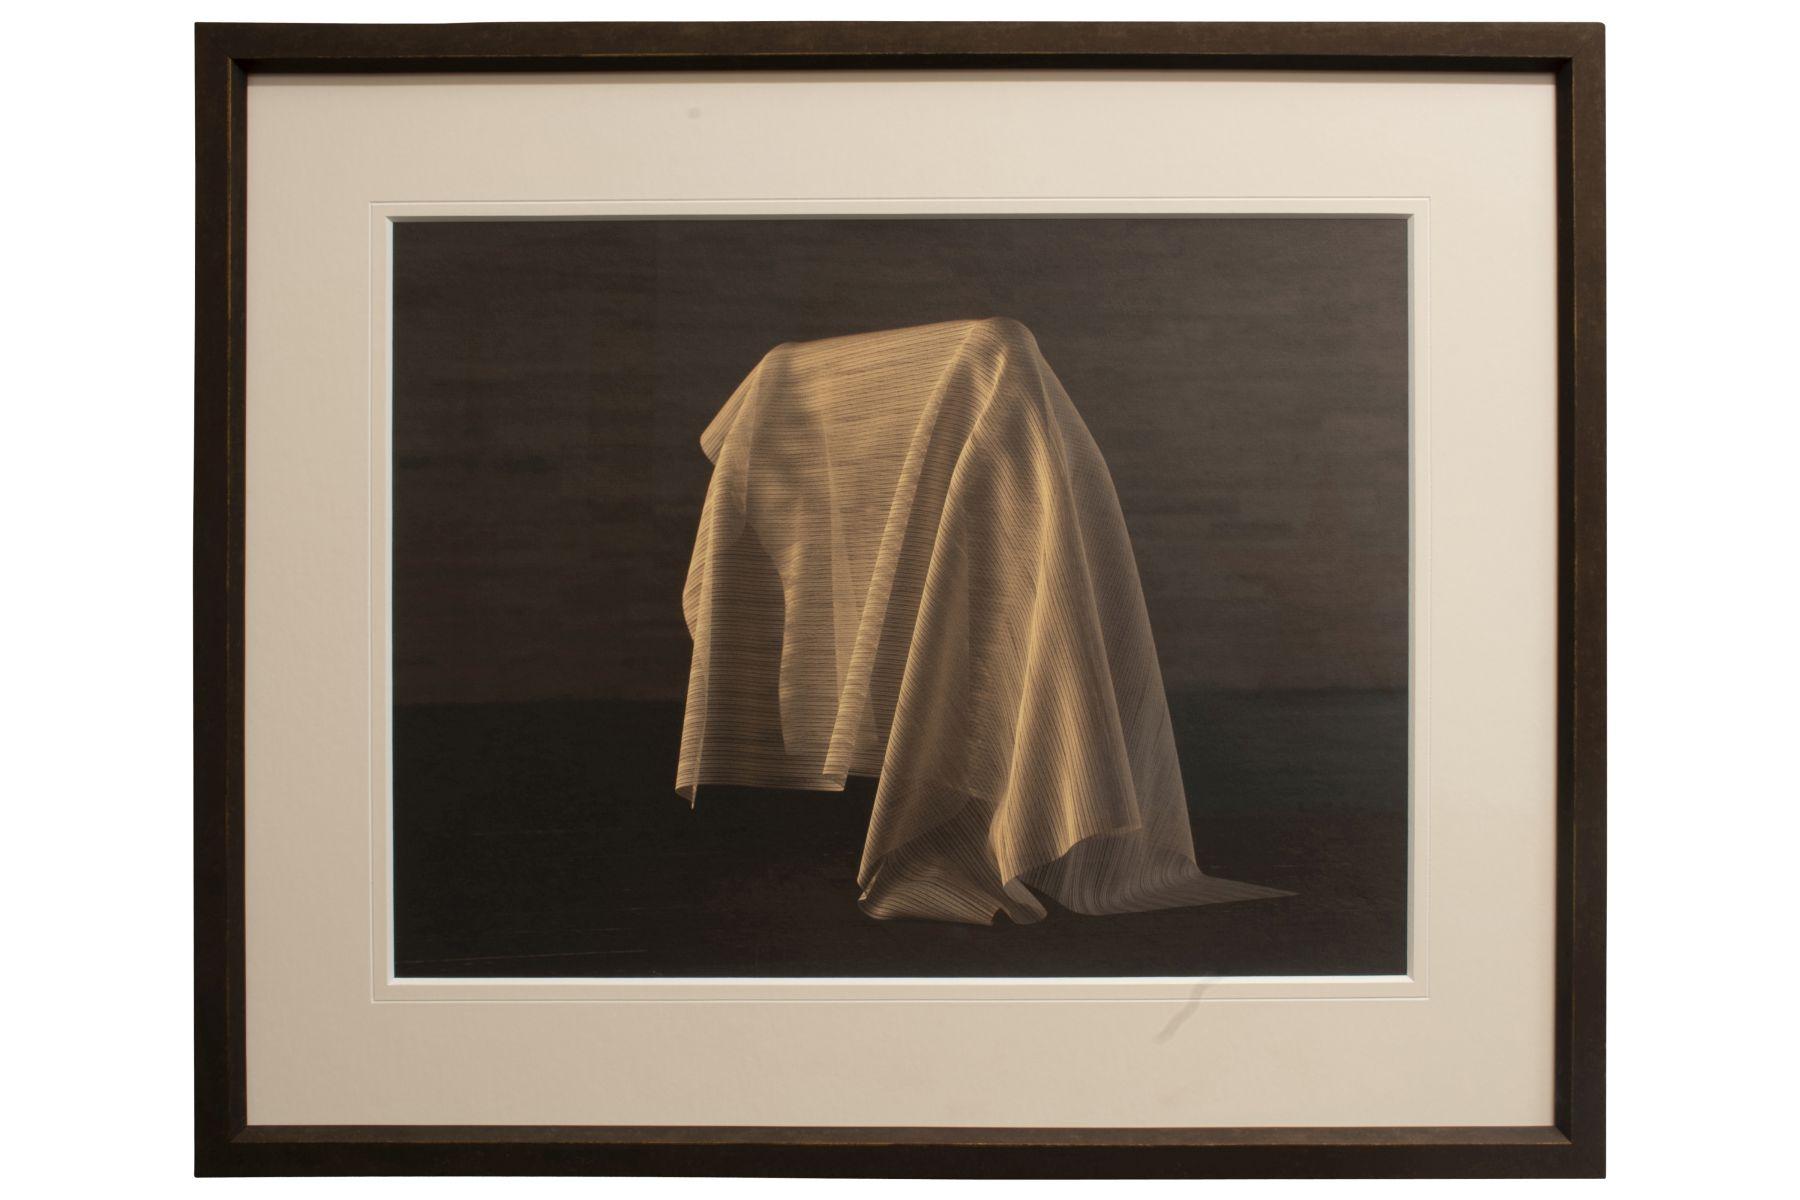 #115 Stefan Krische (1986) Image